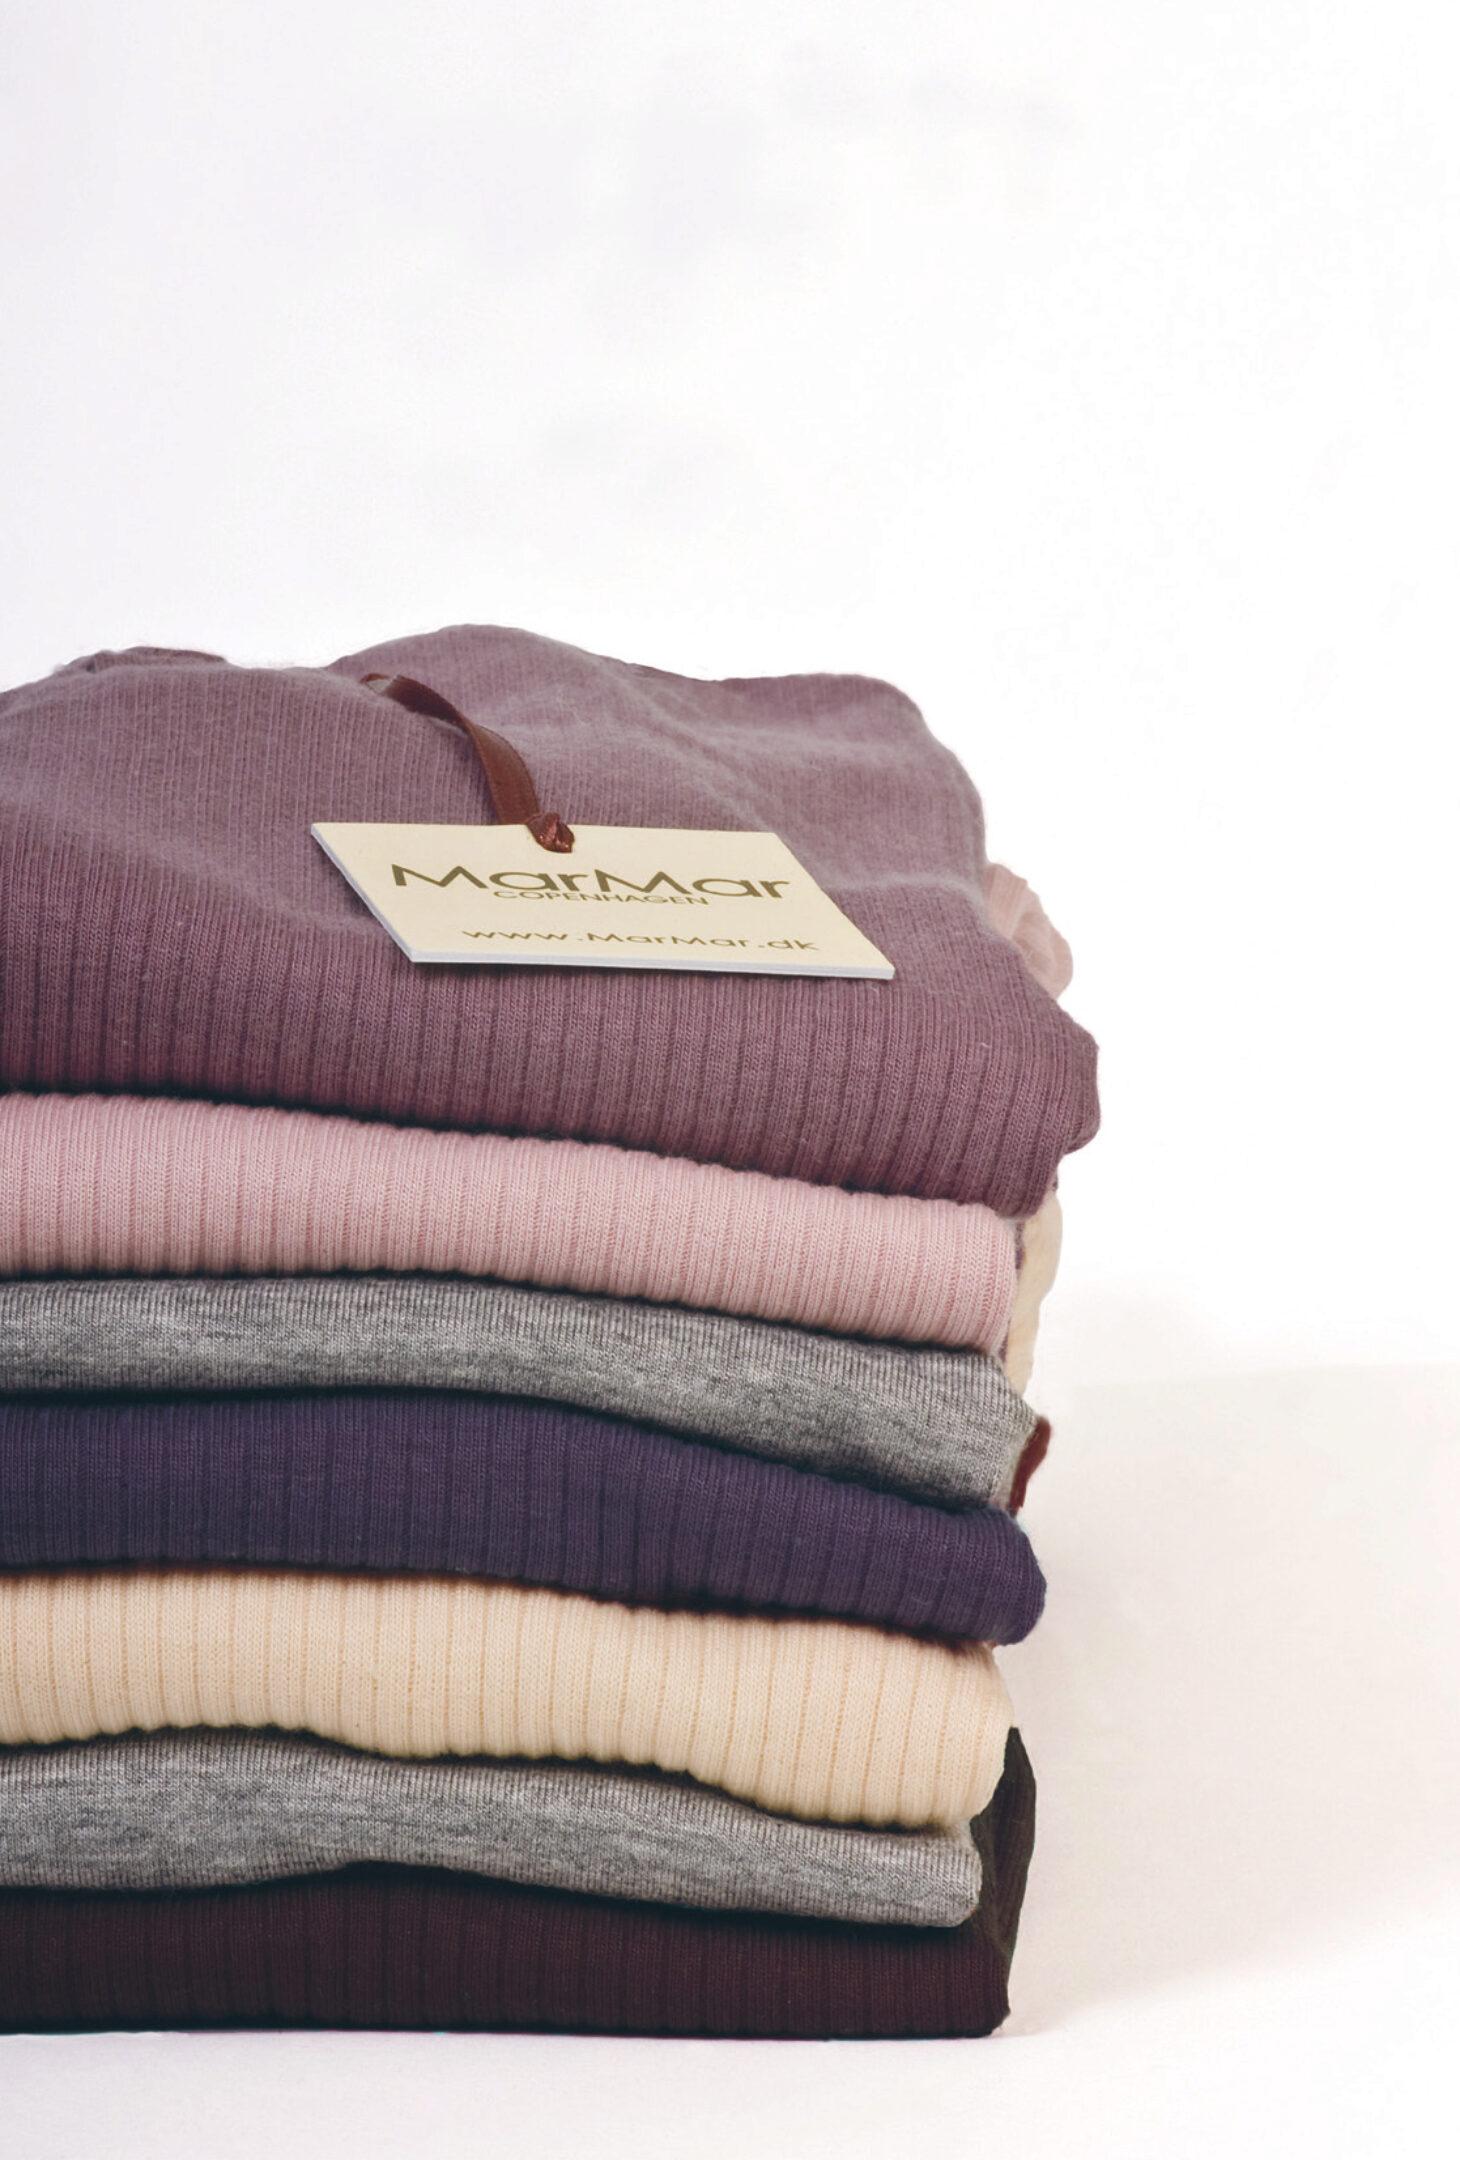 MarMar NOOS clothing stack